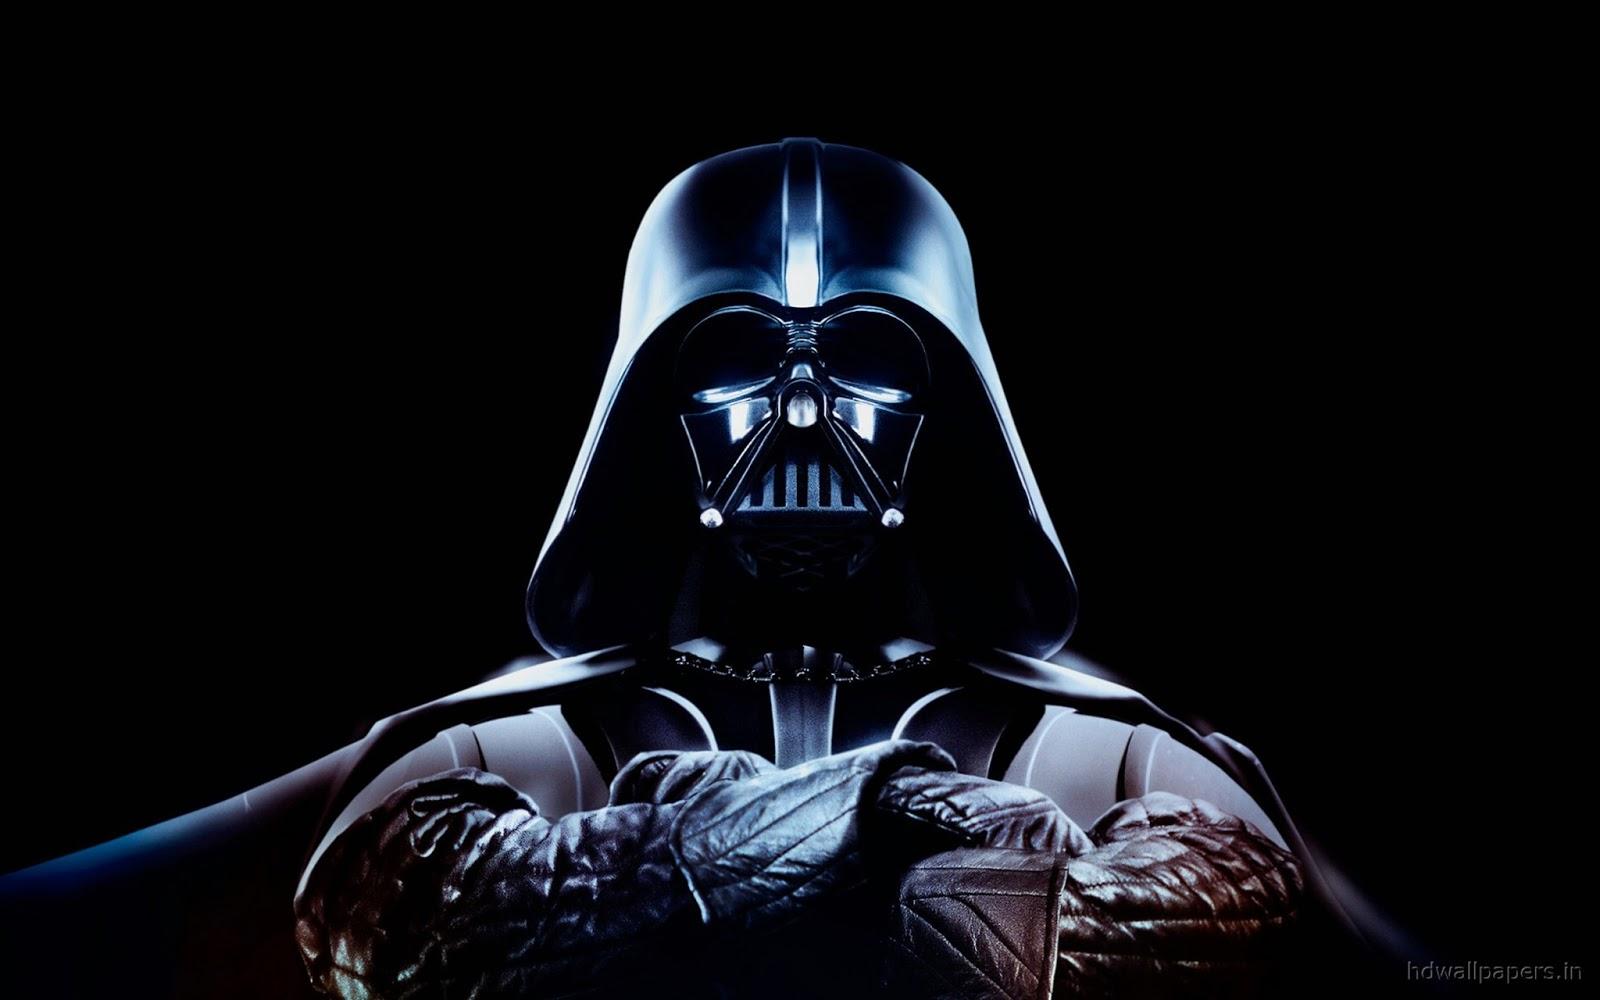 Waterfalls Hd Download Video Wallpaper Live Wallpapers Darth Vader Close Up 1600x1000 Wallpaper Teahub Io